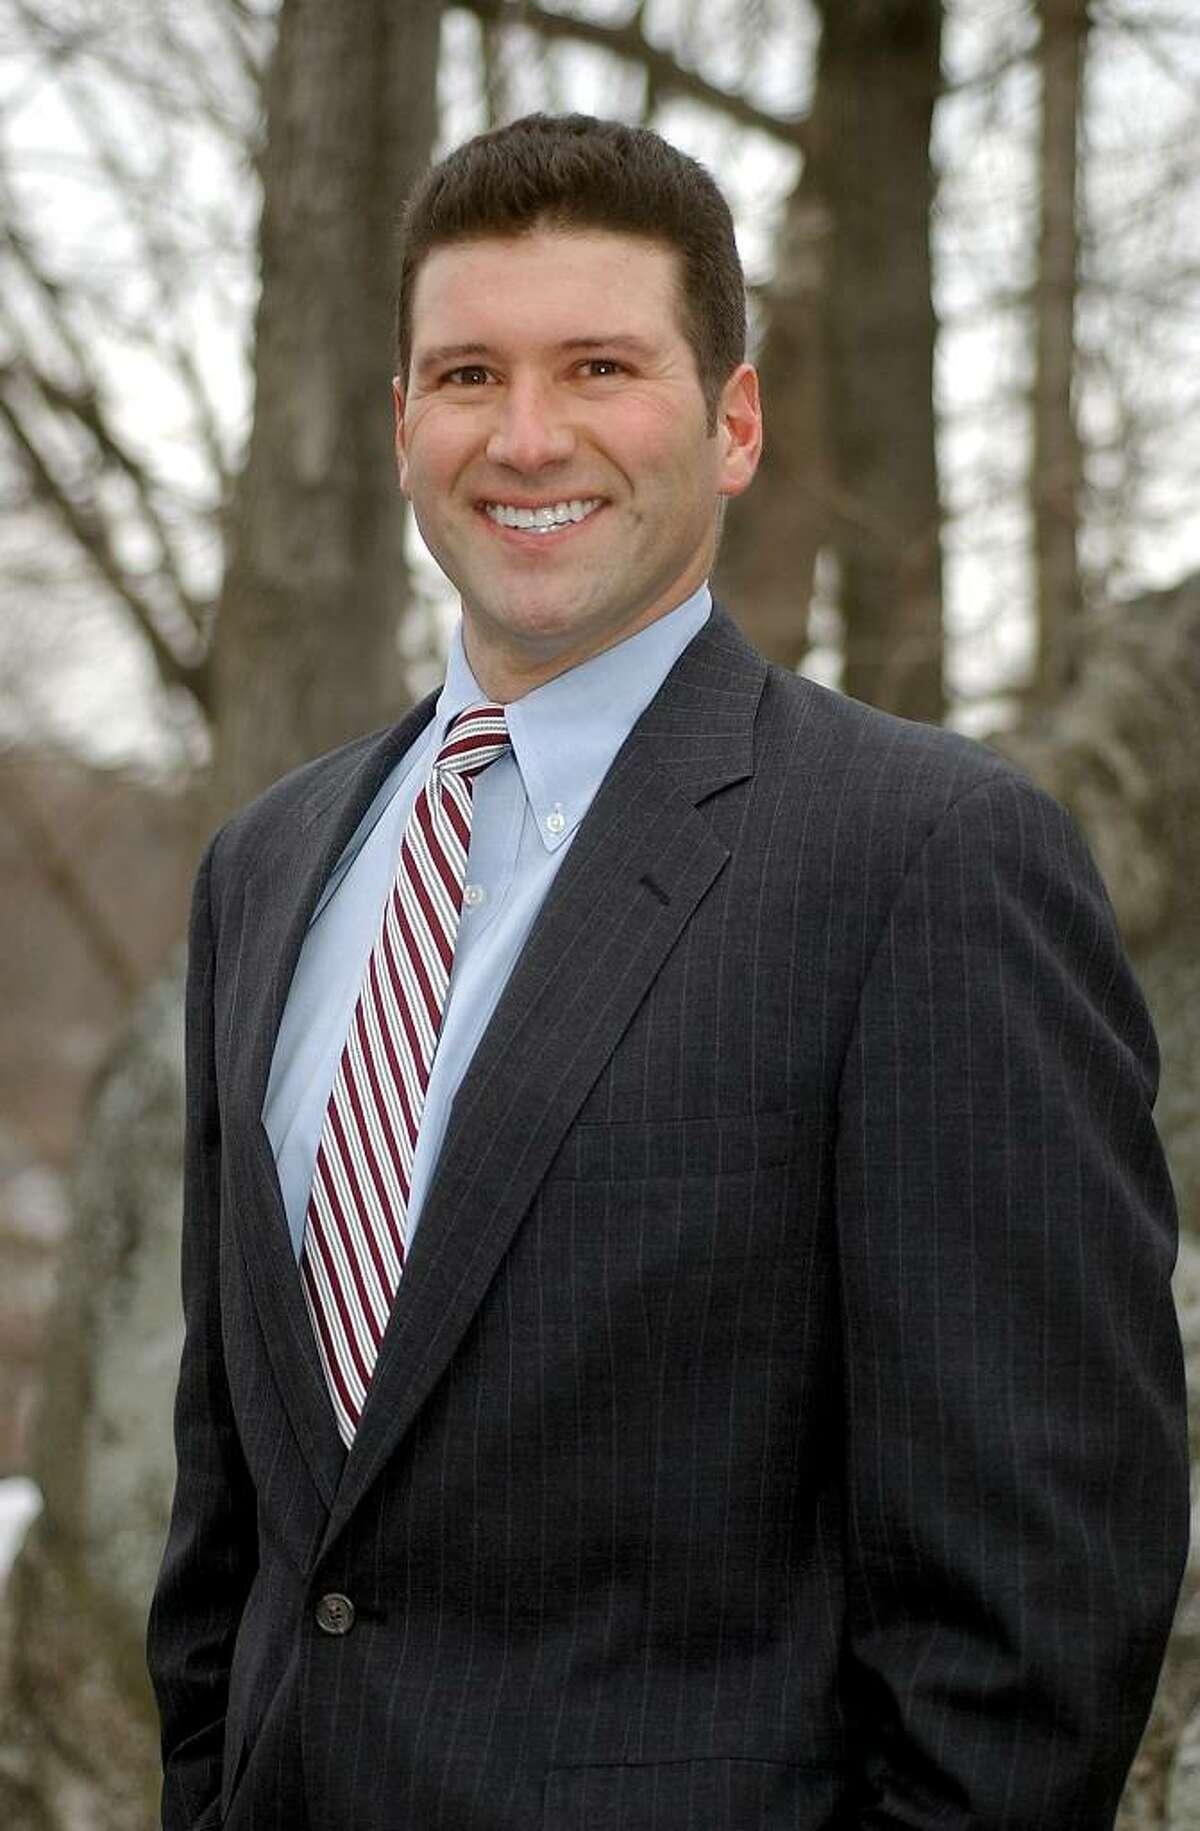 Merrick Alpert, Democratic candidate for U.S. Senate